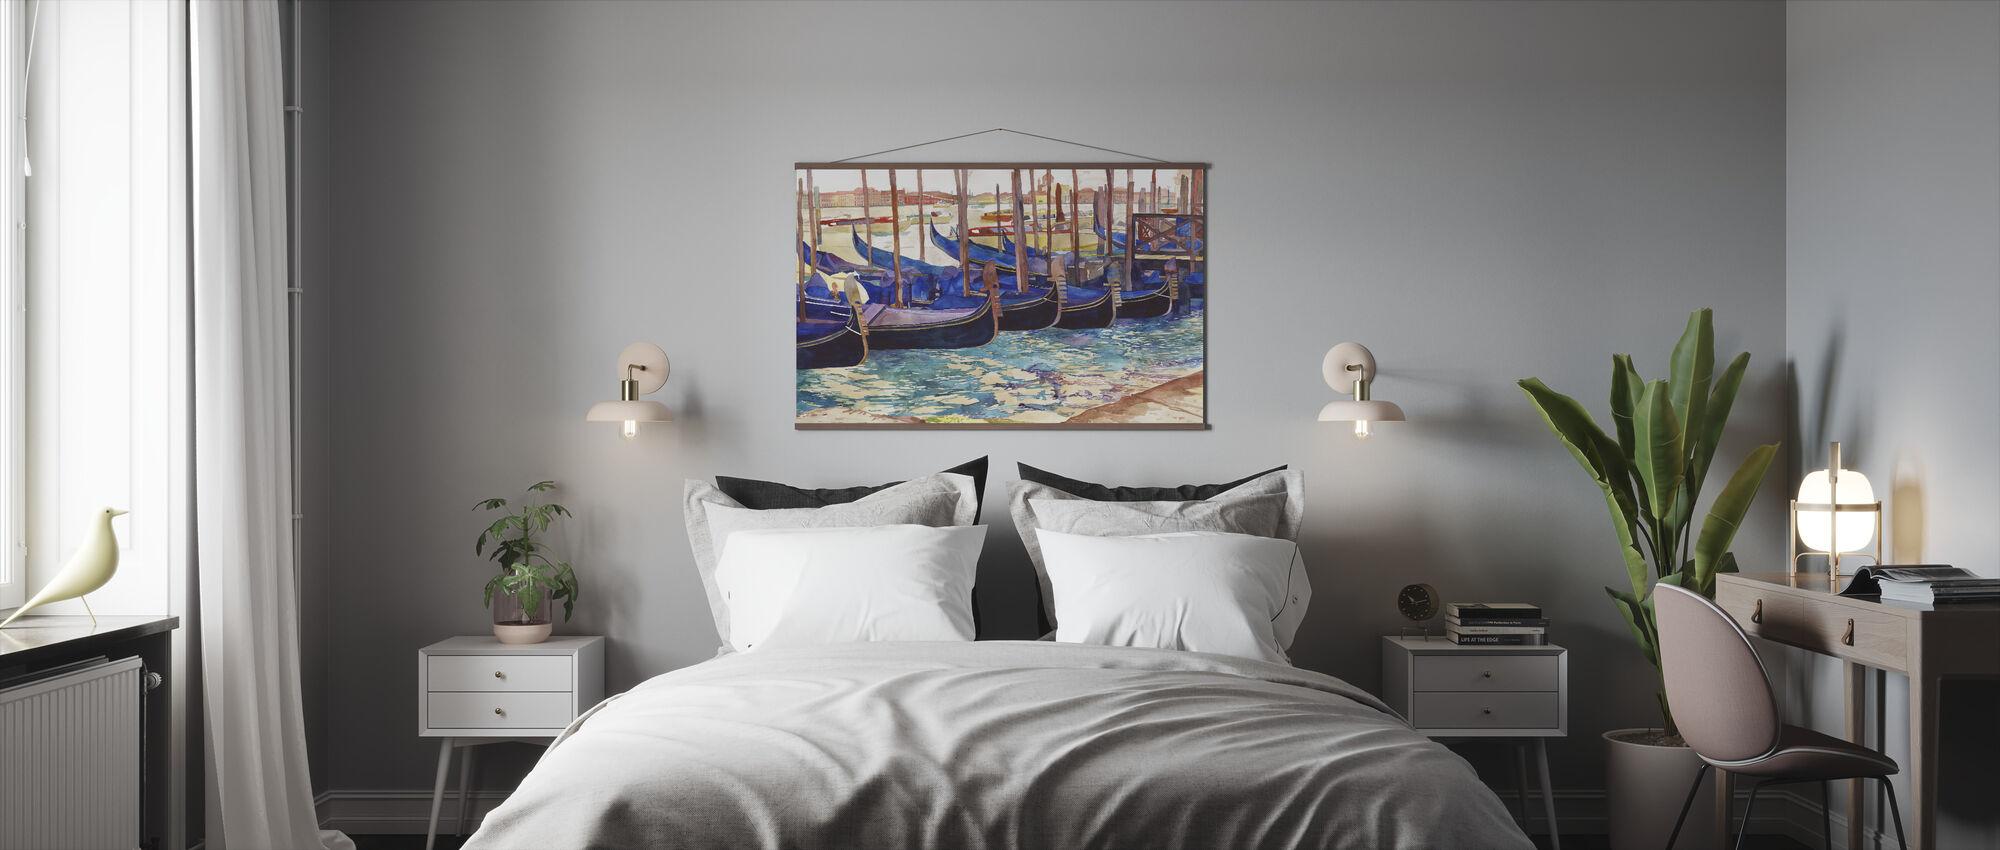 Gondels in Venetië - Poster - Slaapkamer